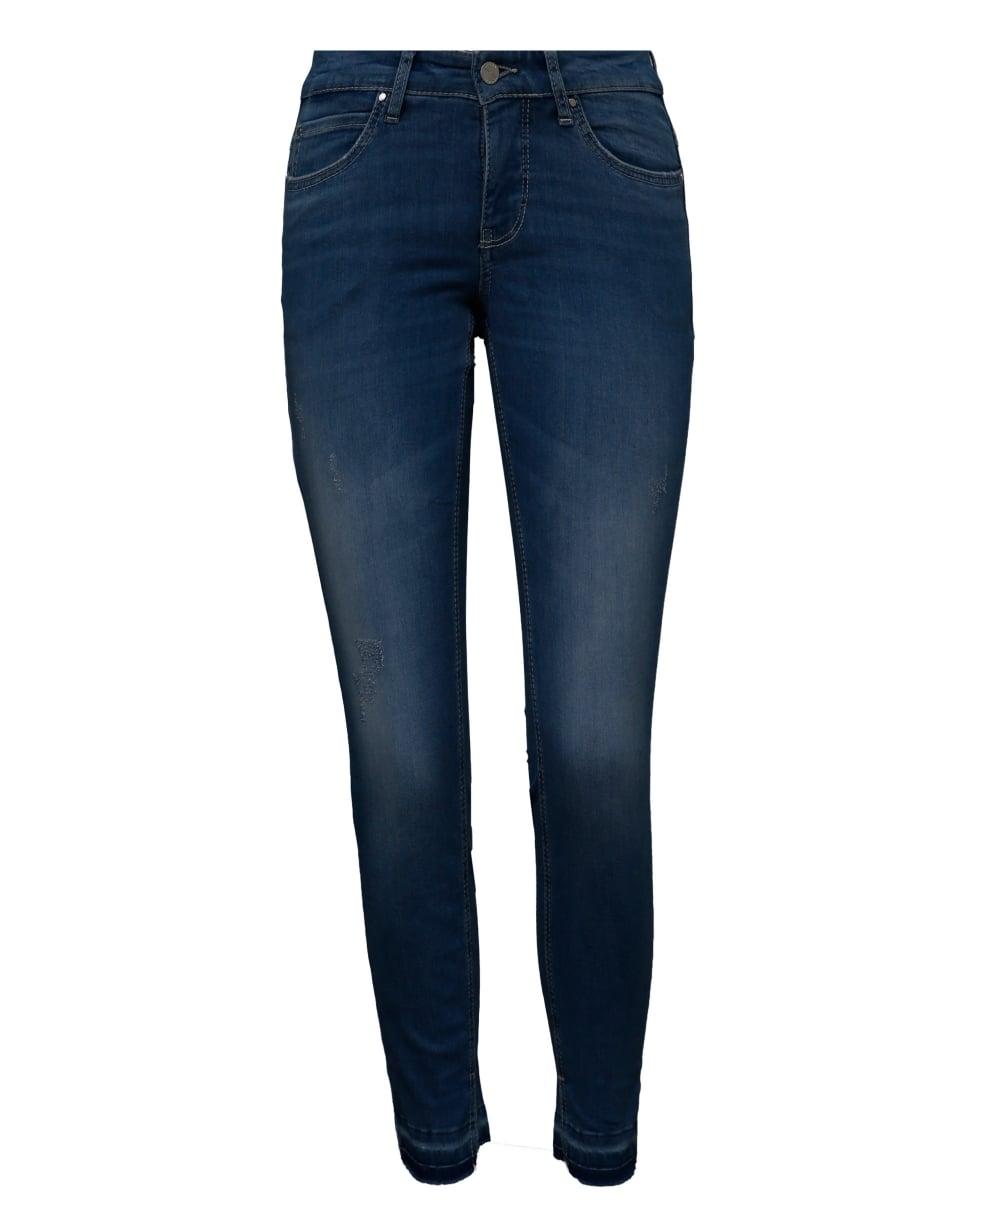 mac dream skinny fringe jeans from luxury uk. Black Bedroom Furniture Sets. Home Design Ideas